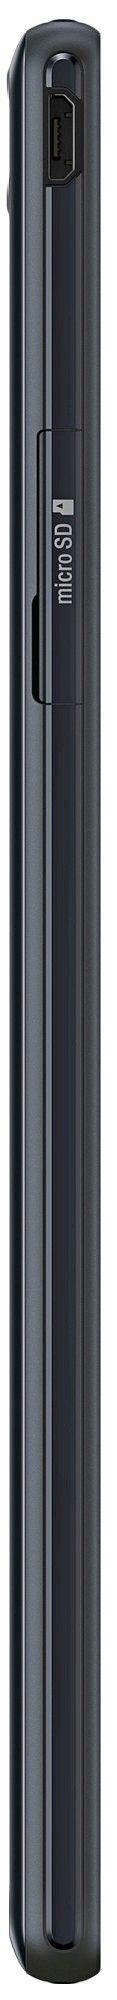 Мобильный телефон Sony D5322 Xperia T2 Ultra Black - 1